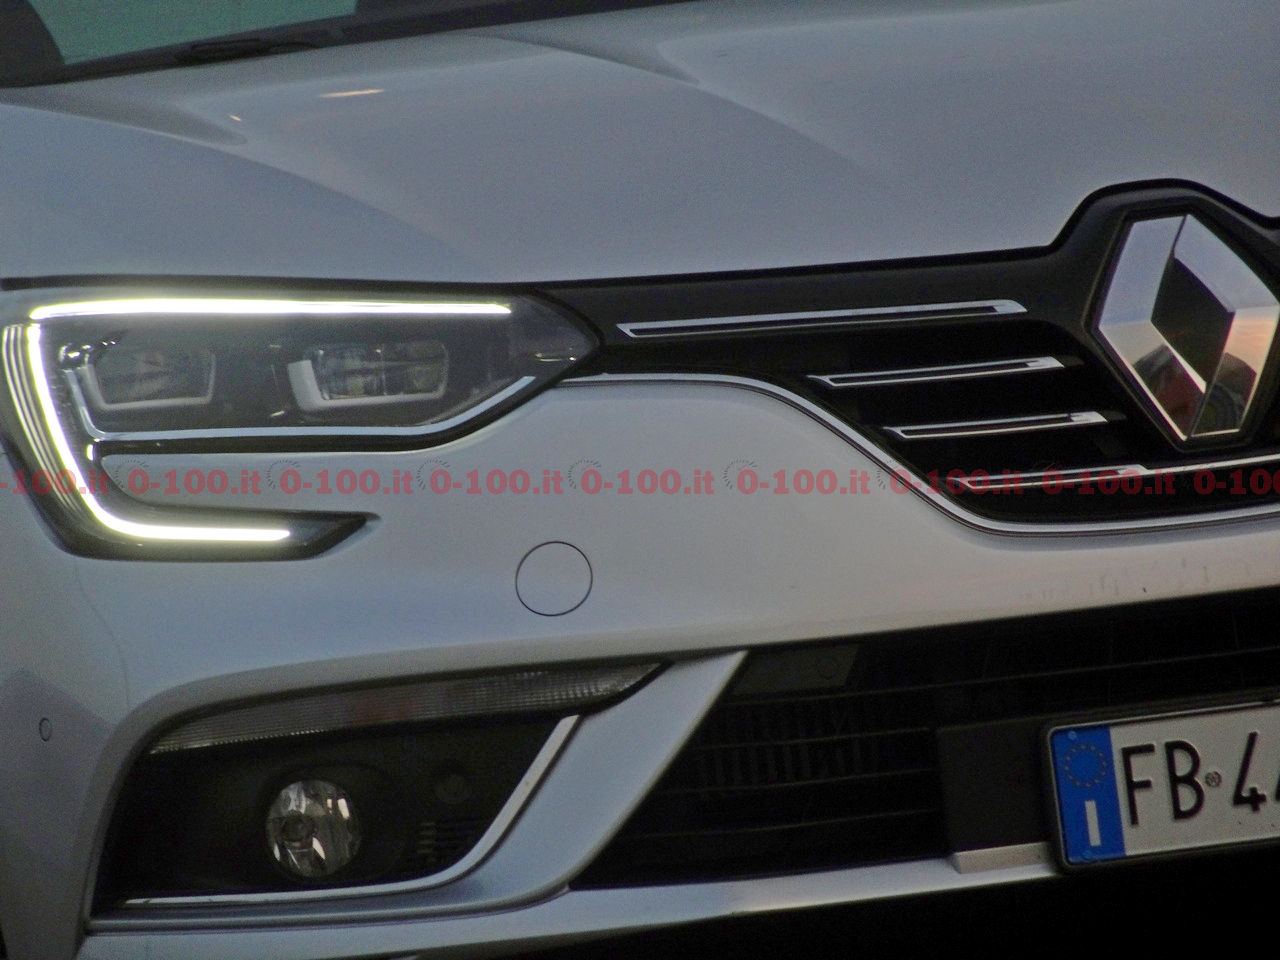 Renault-Megane-GT-Bose-dCi-130-test-prova-opinioni_0-100_9